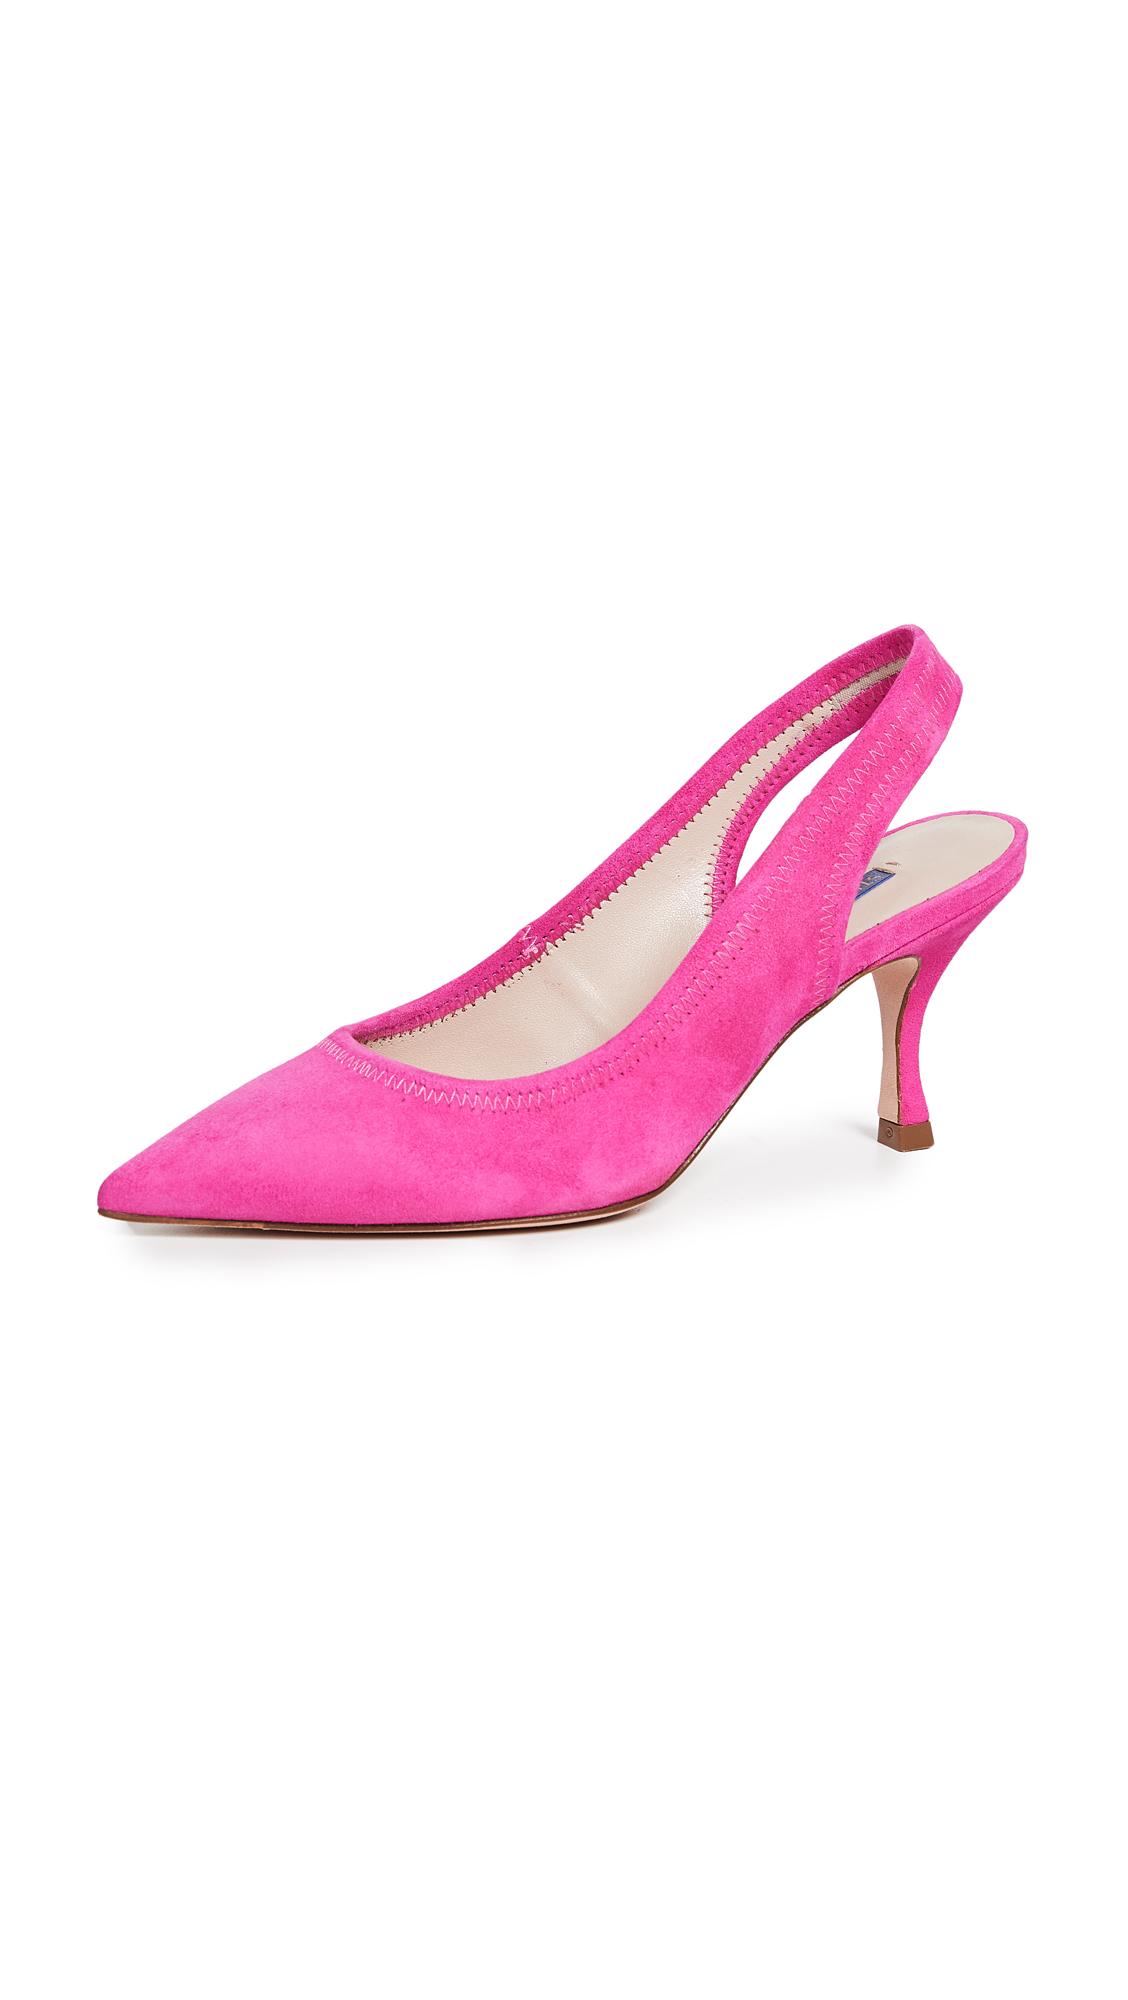 Stuart Weitzman Odette Slingback Pumps - Flamingo